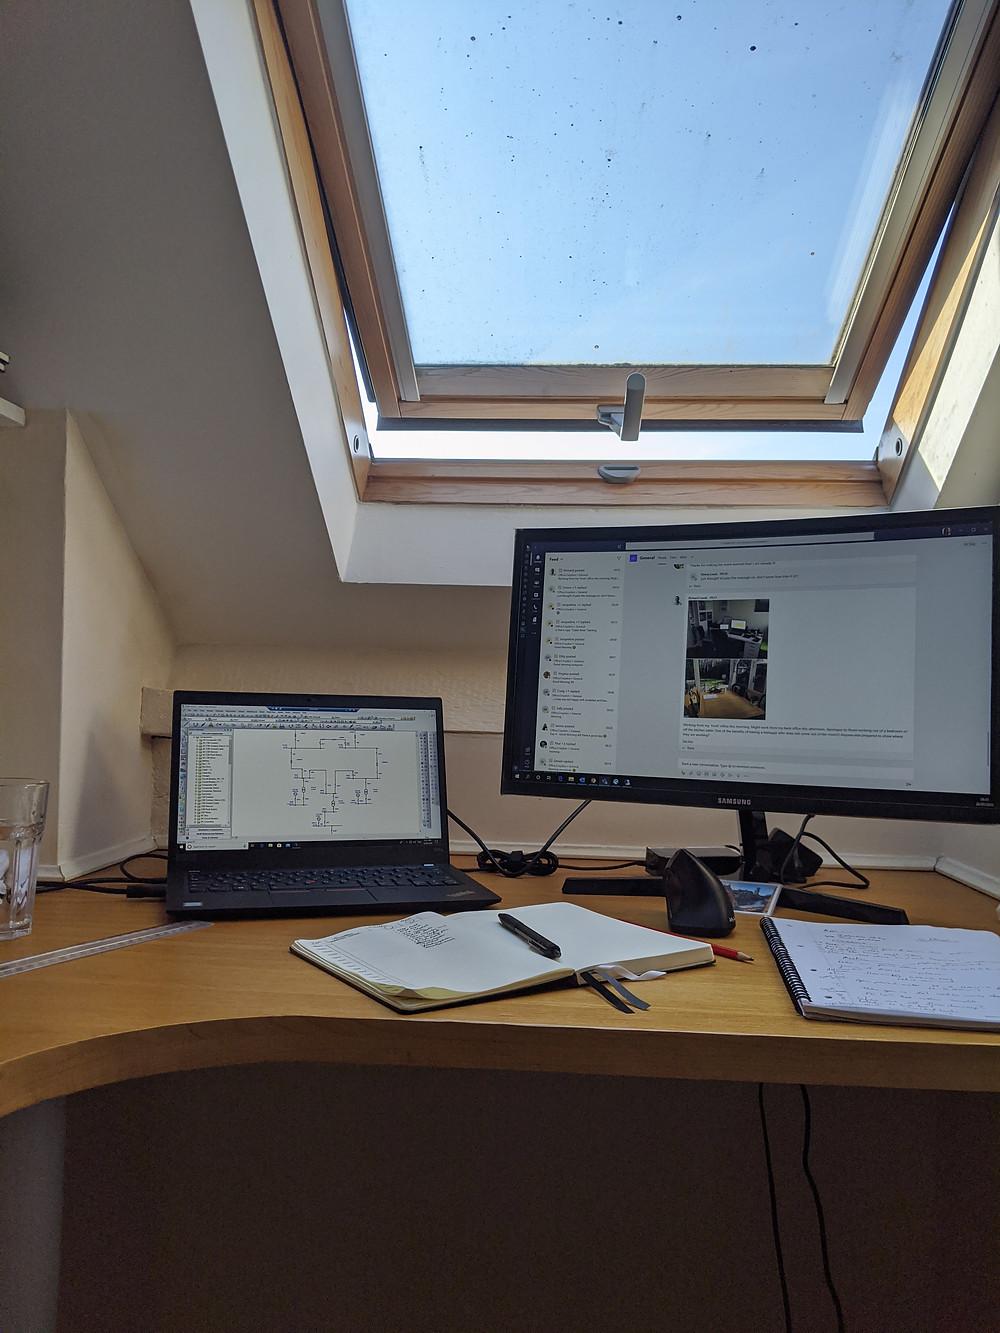 WFH Desk set up